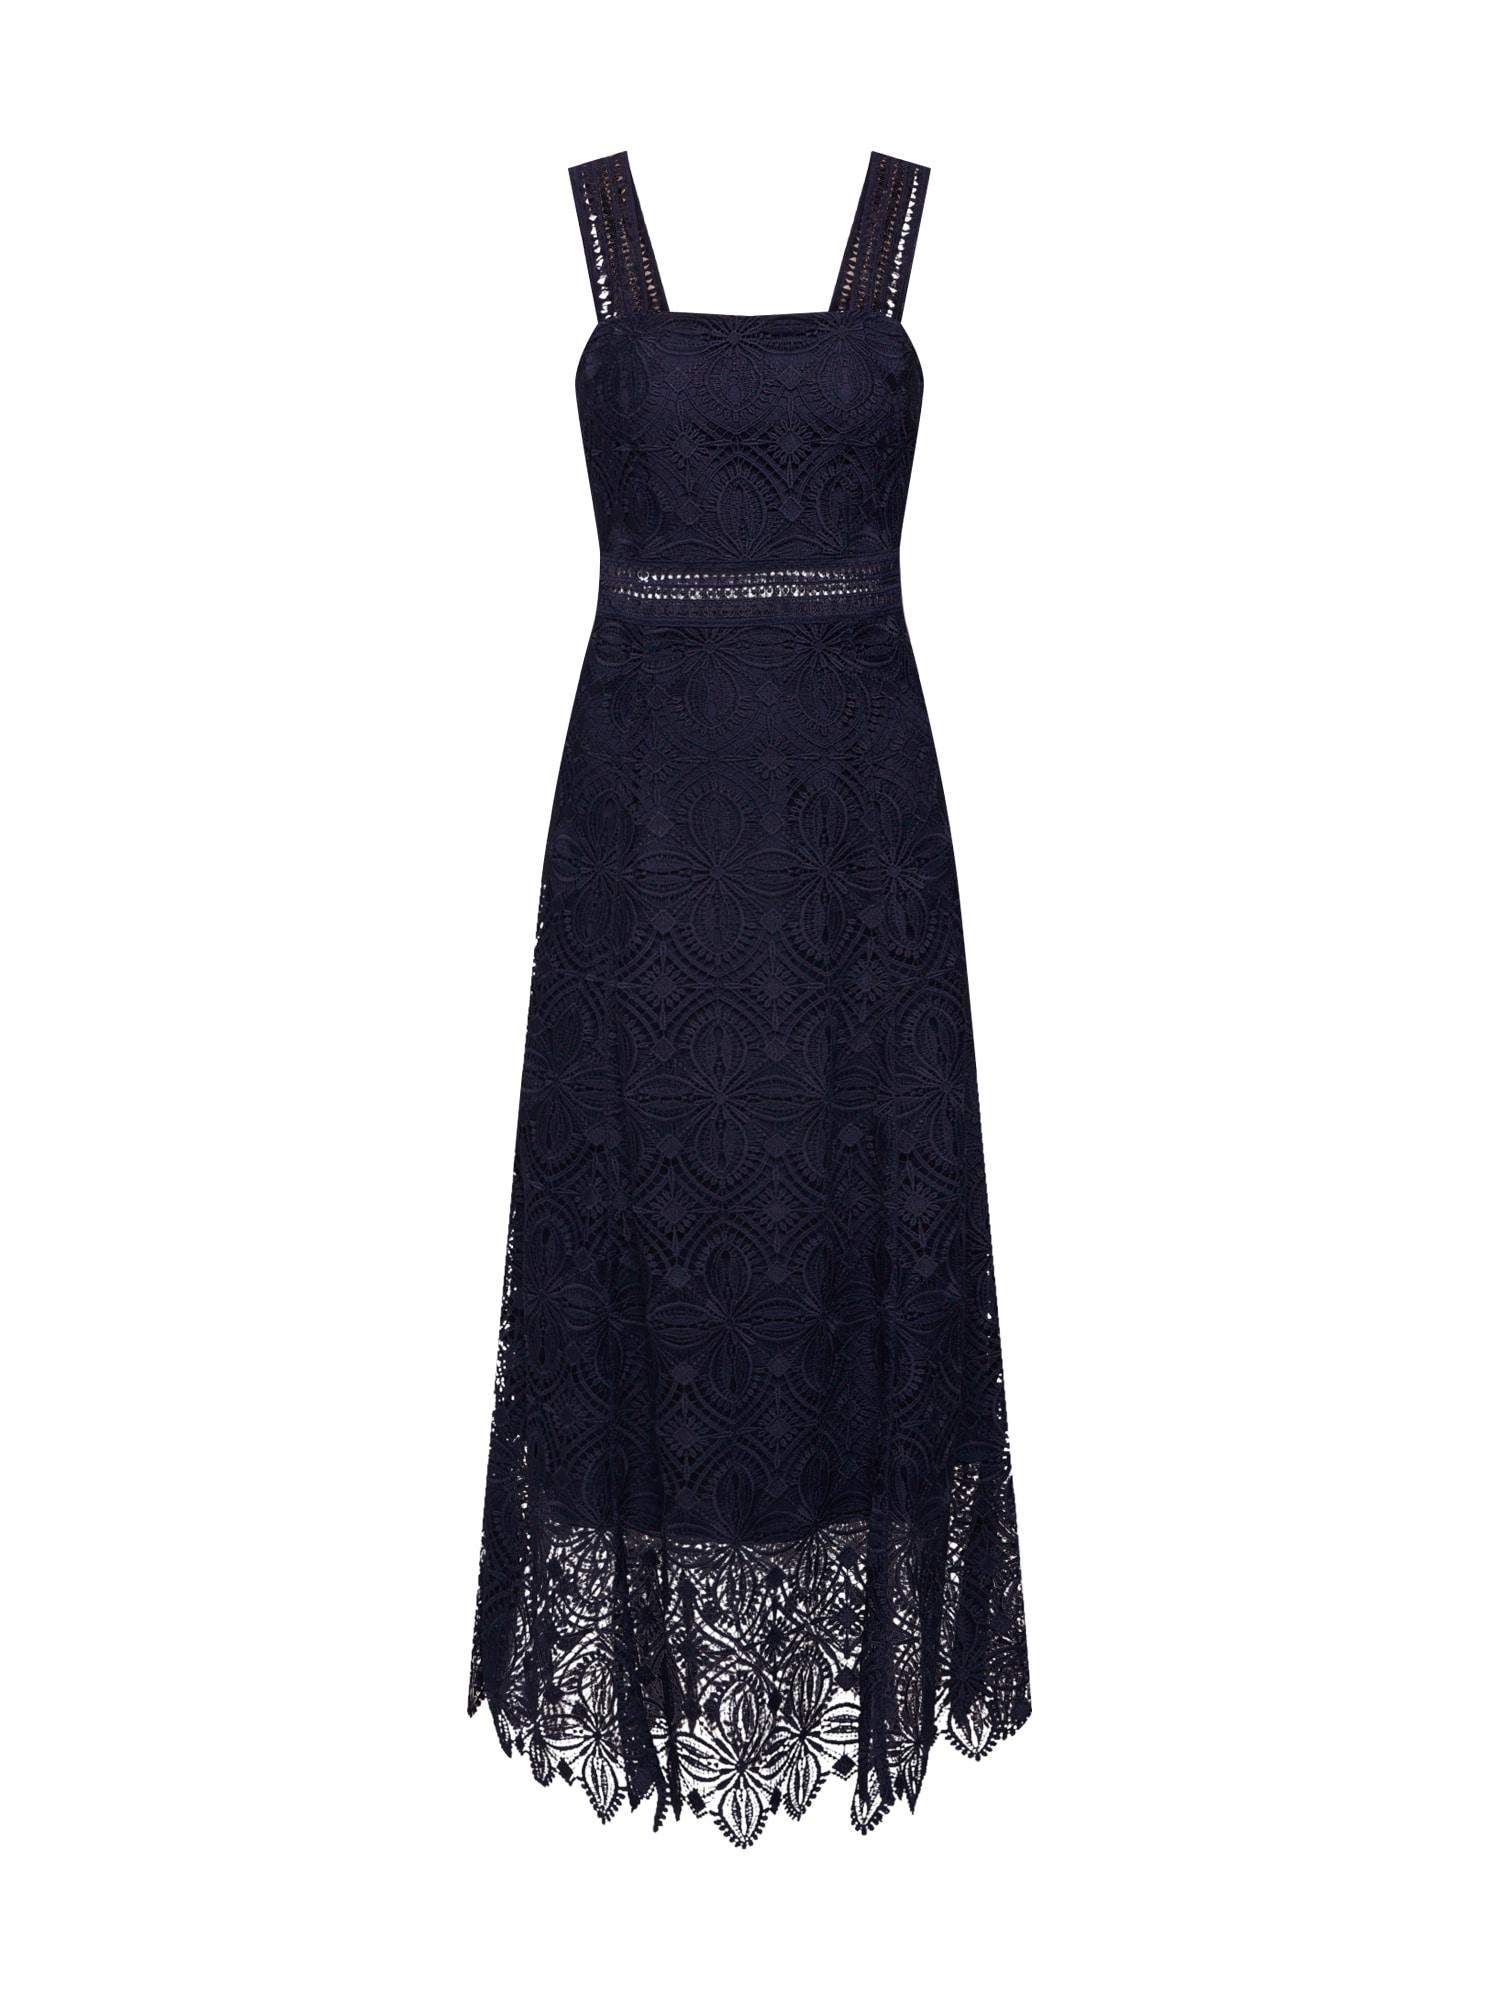 IVY & OAK Suknelė tamsiai mėlyna jūros spalva